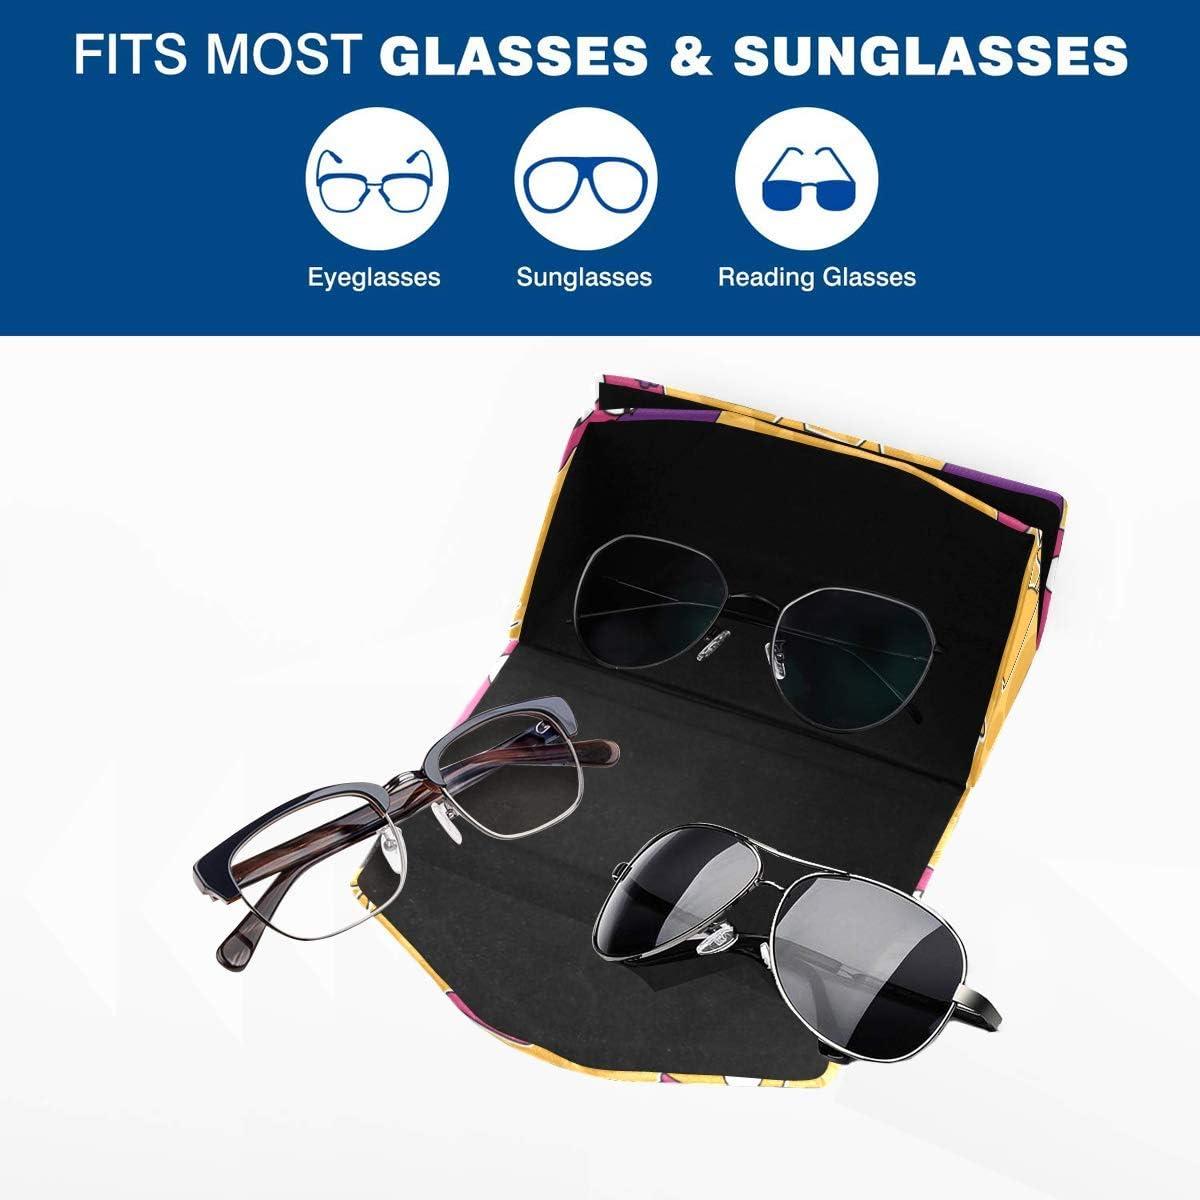 Glasses Case Funny Cartoon Cats Meow Eyeglass Case Leather Magnetic Folding Hard Case Sunglasses Eyewear Protective Case